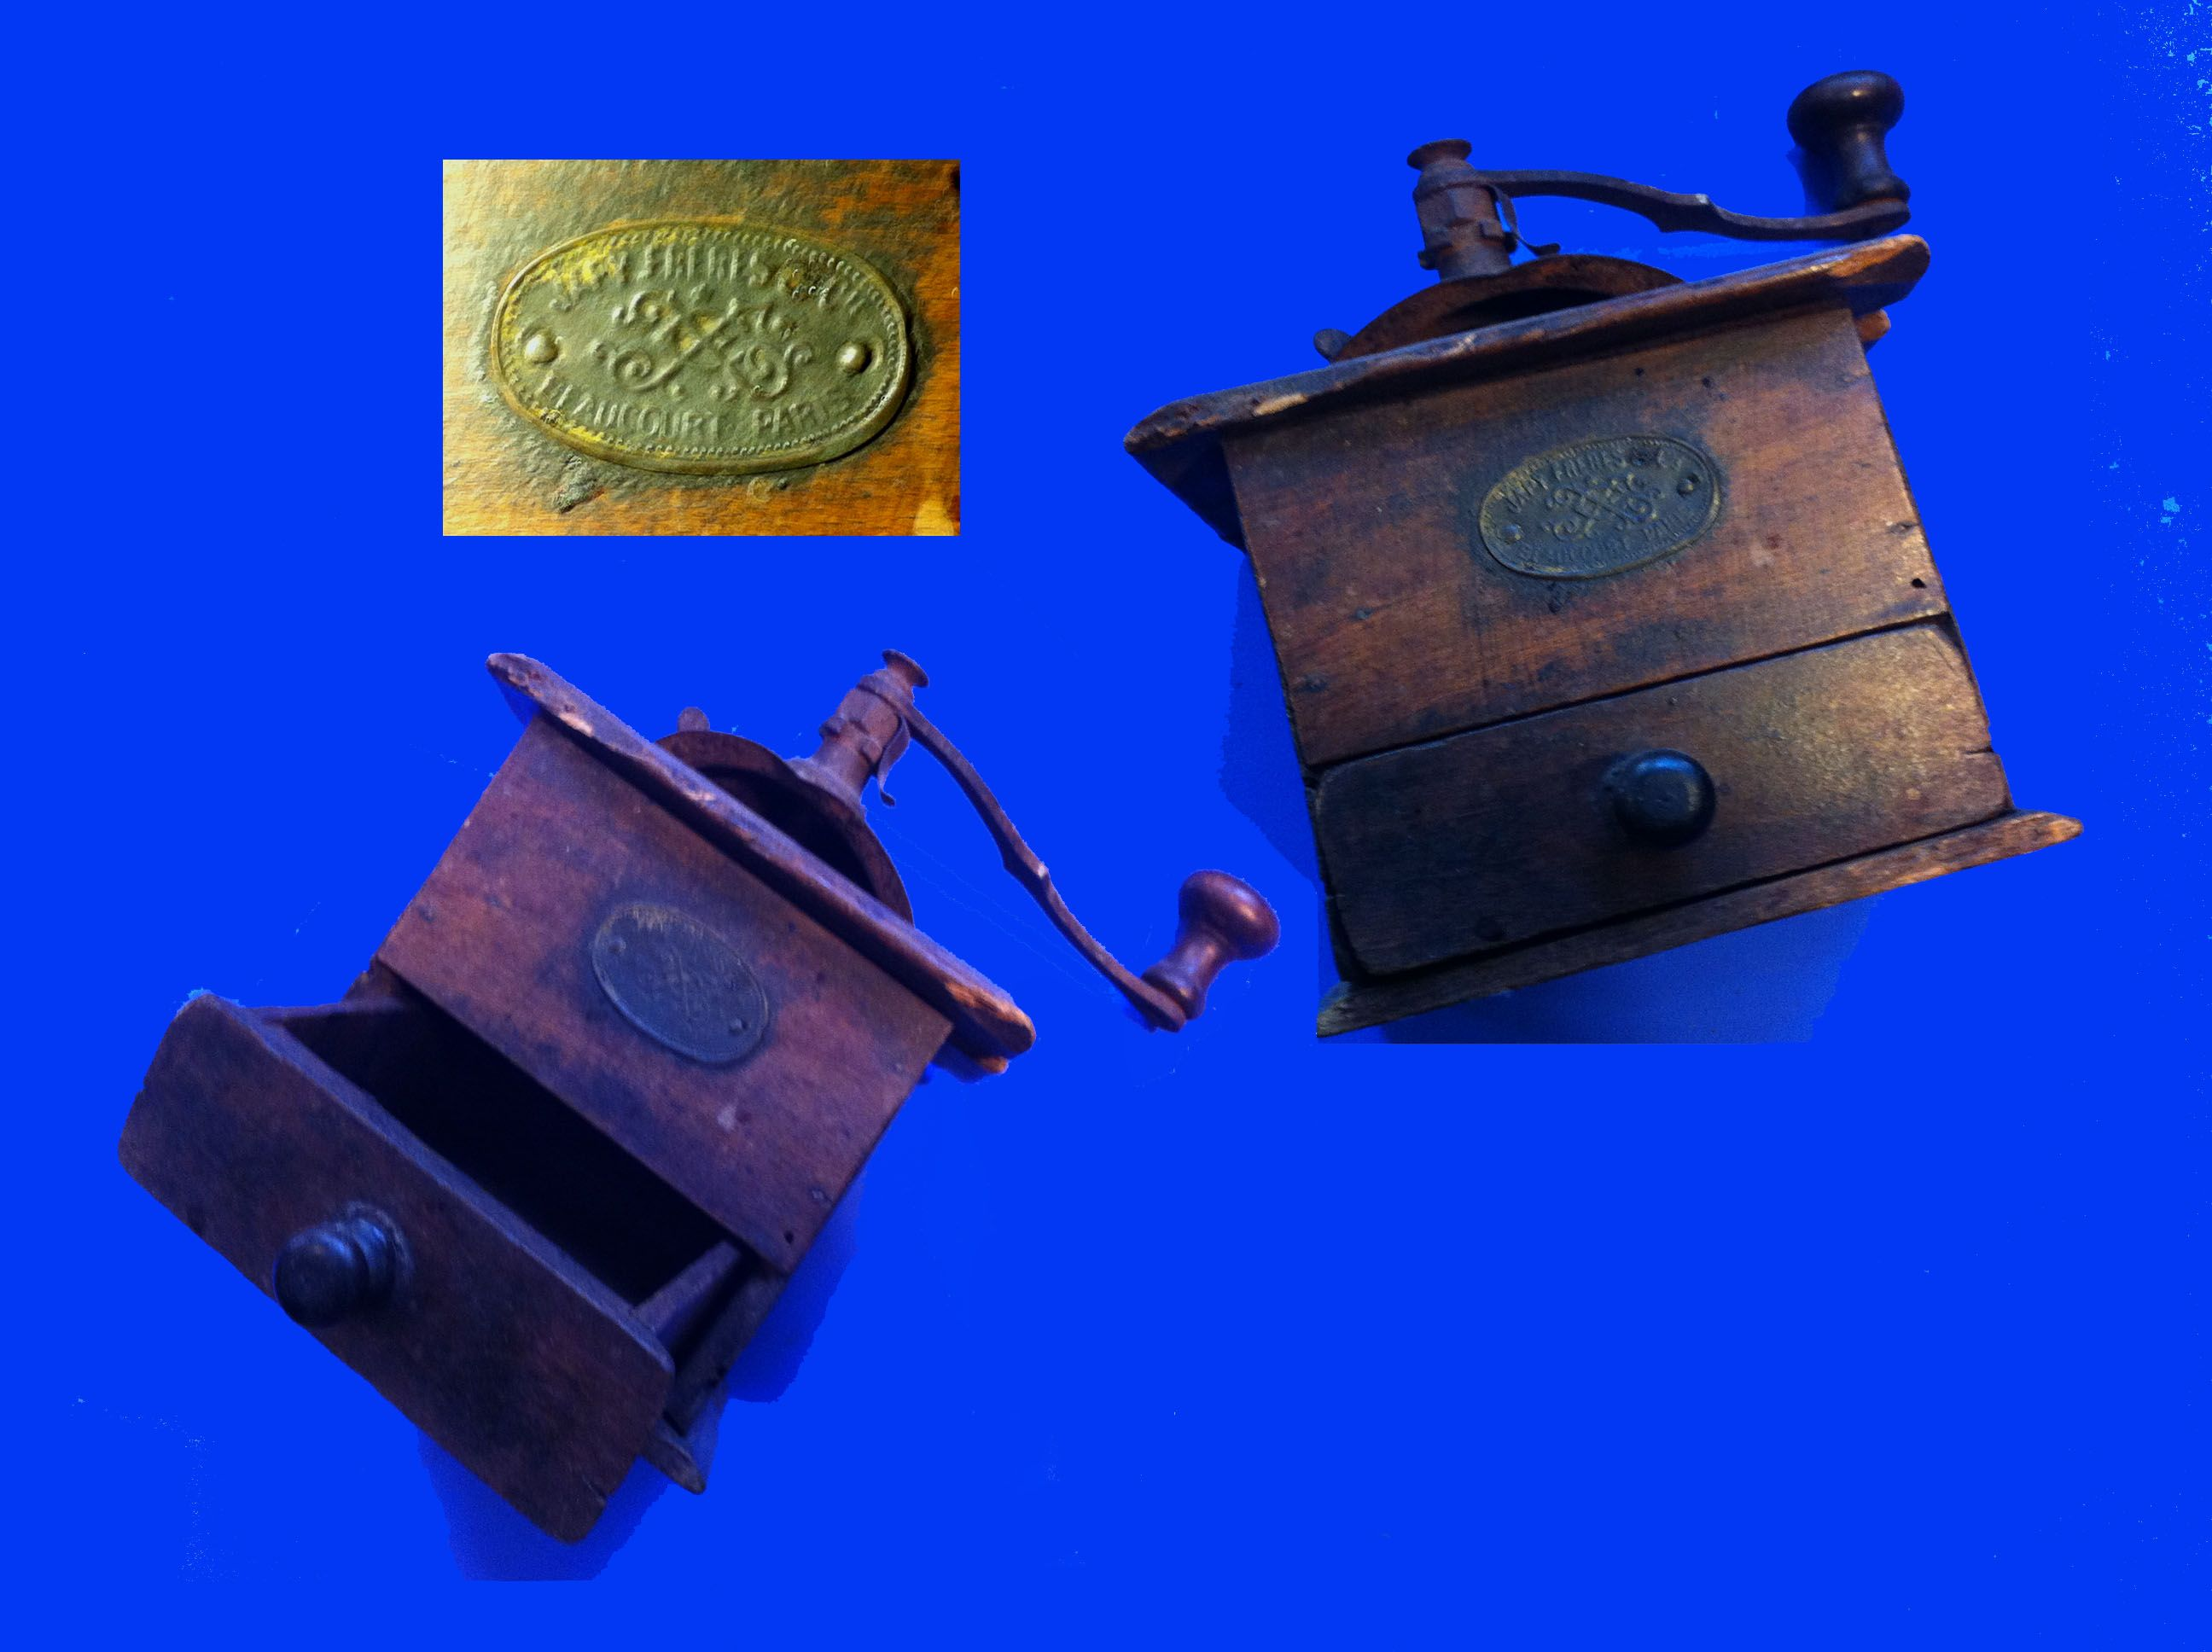 Last century grinder, working !!Ed Darino's collection. (copyright image).